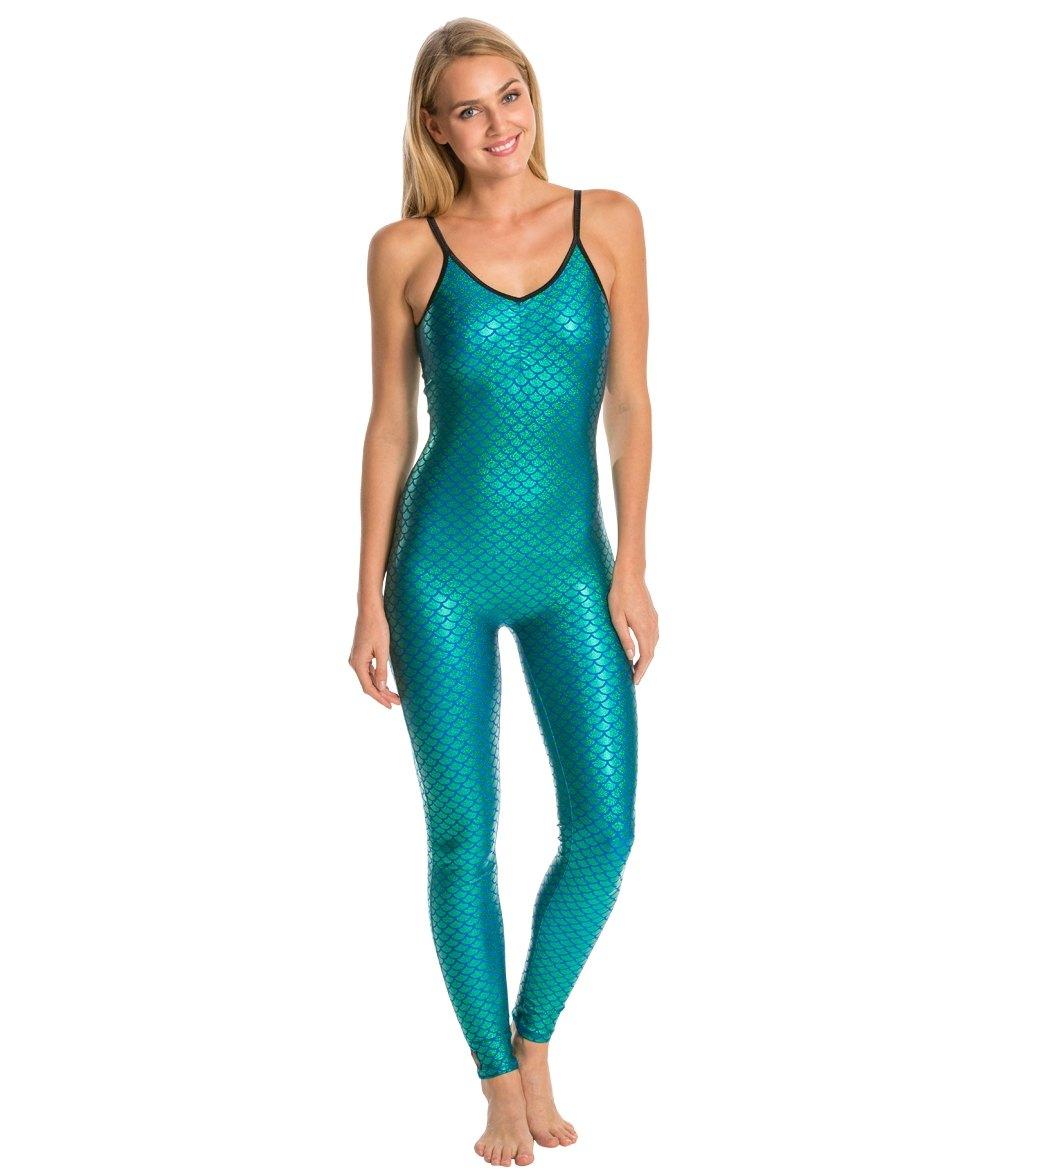 ef51963579ee Purusha People Mermaid Spirit Yoga   Dance Long Leotard at ...